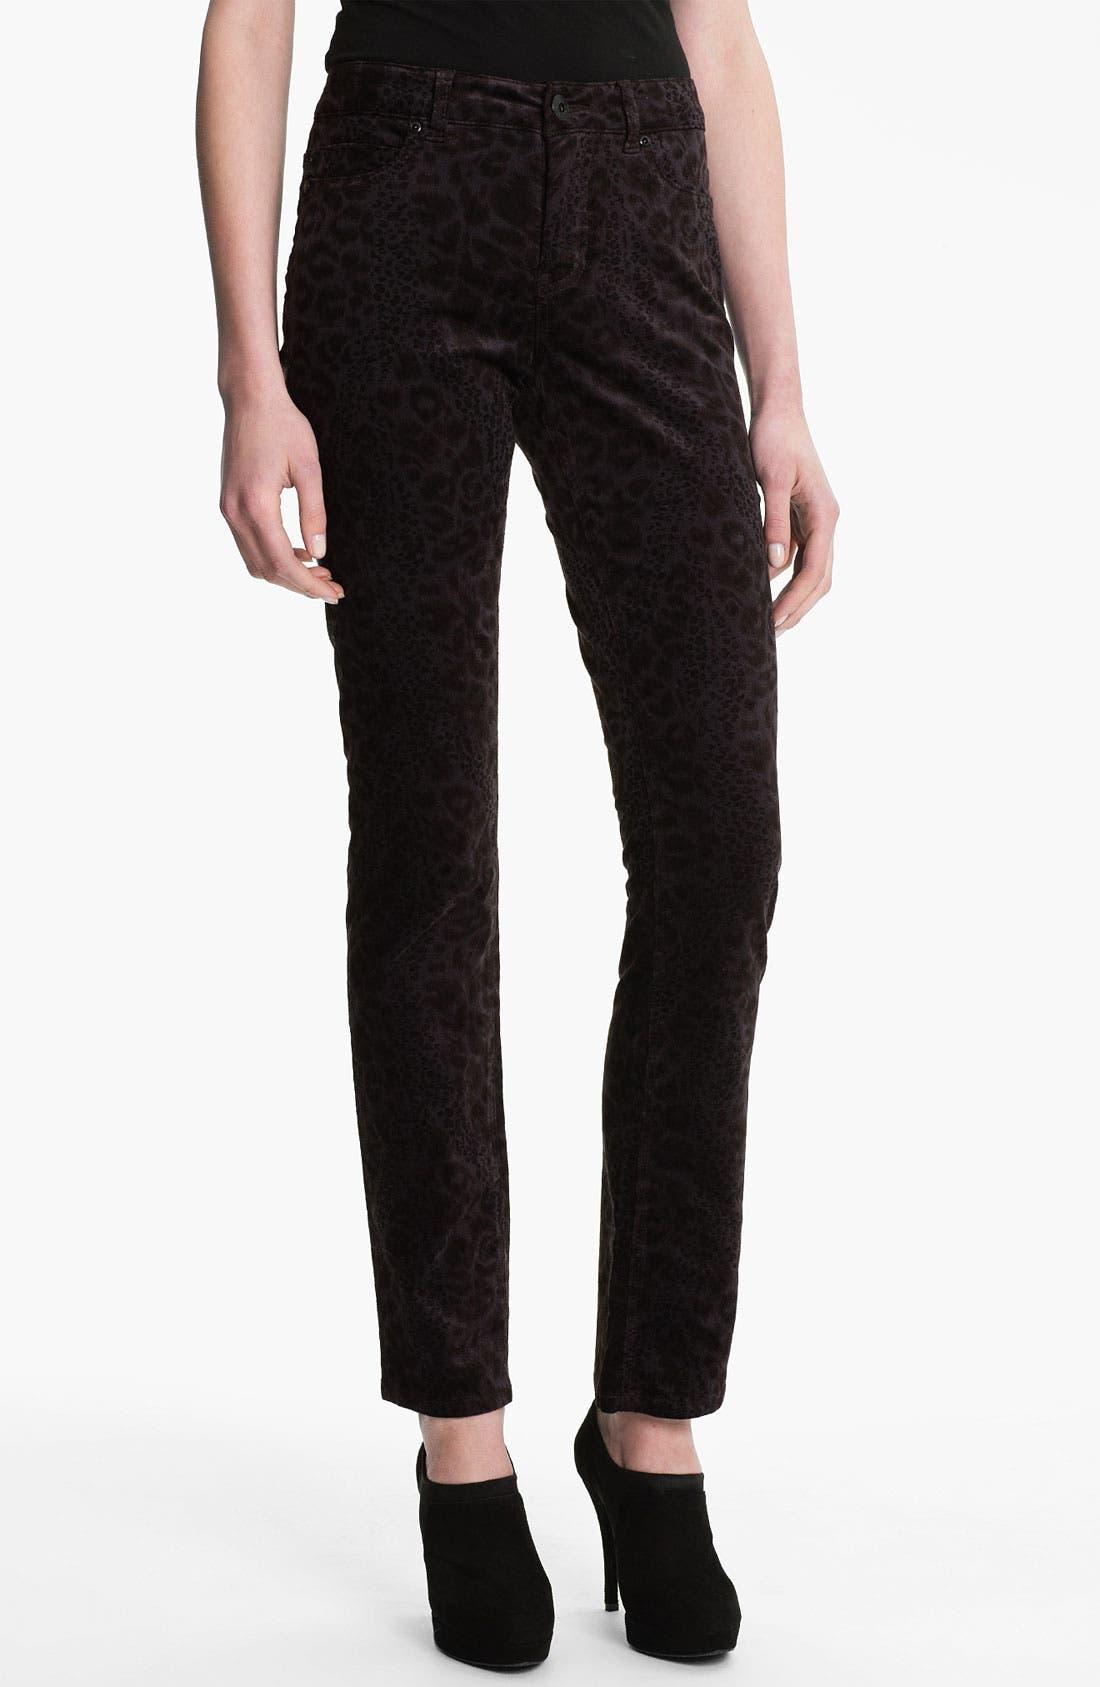 Main Image - Liverpool Jeans Company 'Sadie' Print Straight Leg Velveteen Jeans